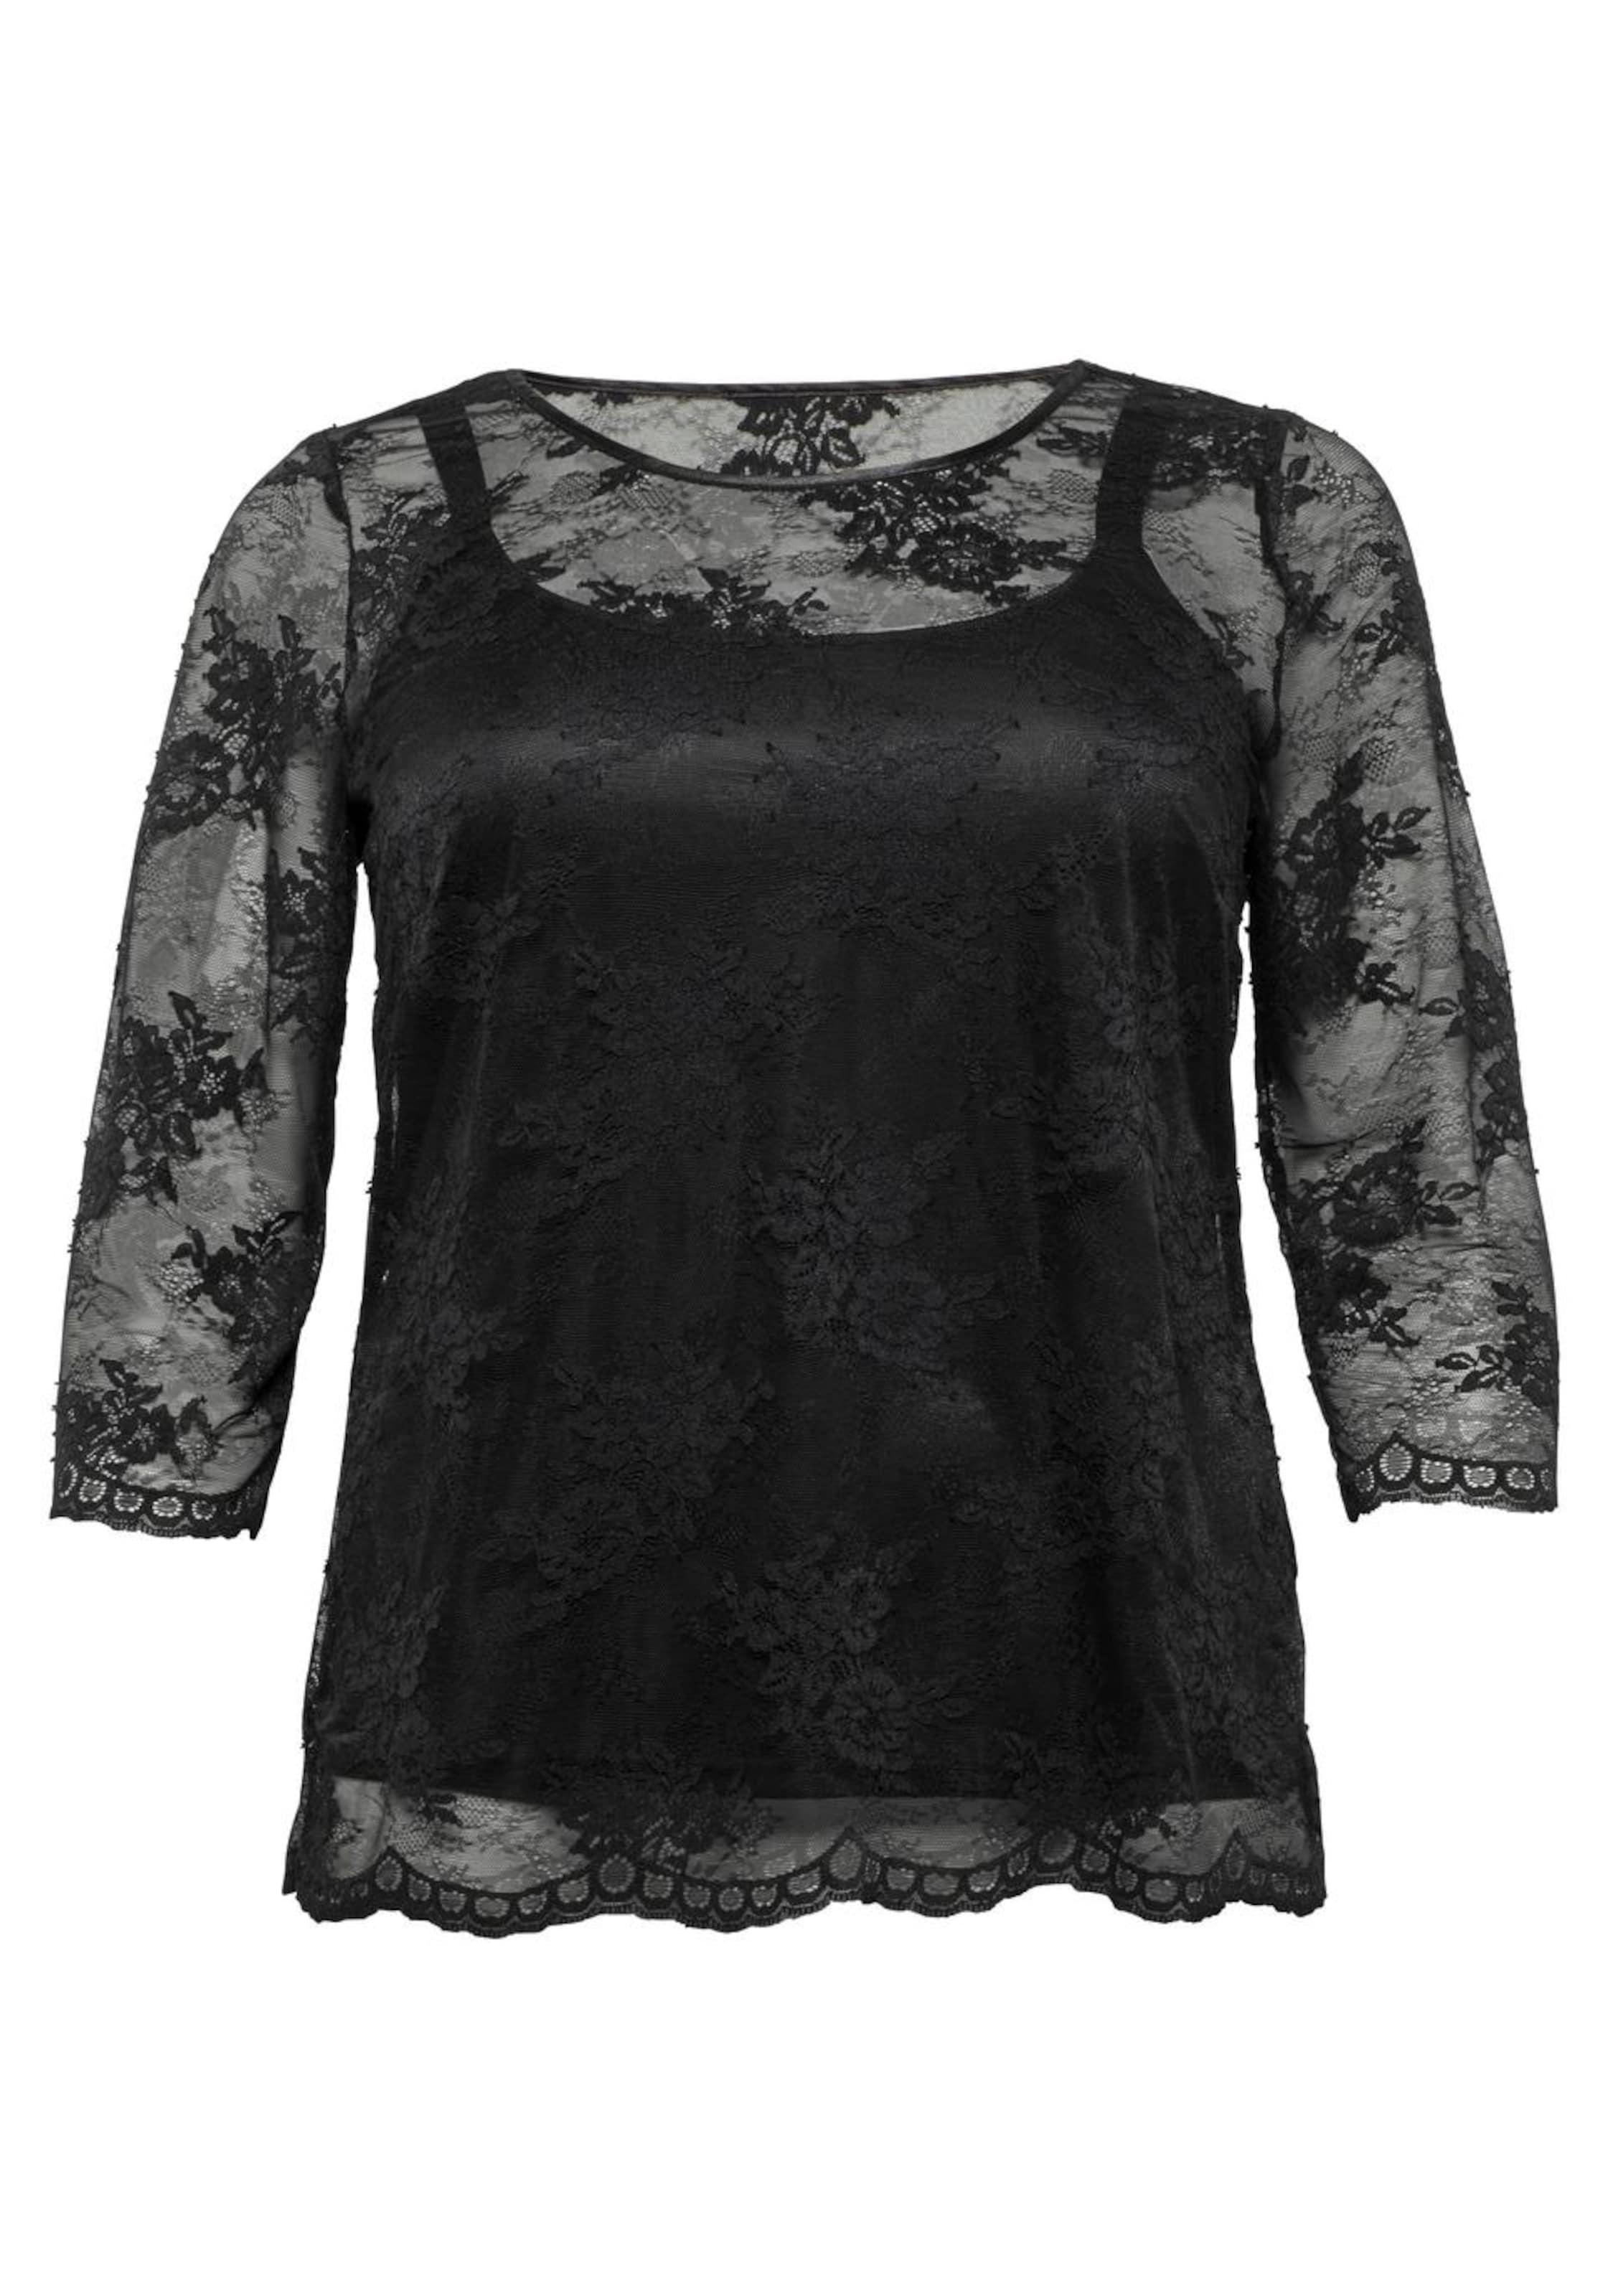 Spitzenshirt Schwarz In Sheego Sheego Sheego Spitzenshirt Style Style In Schwarz lTK31FJc